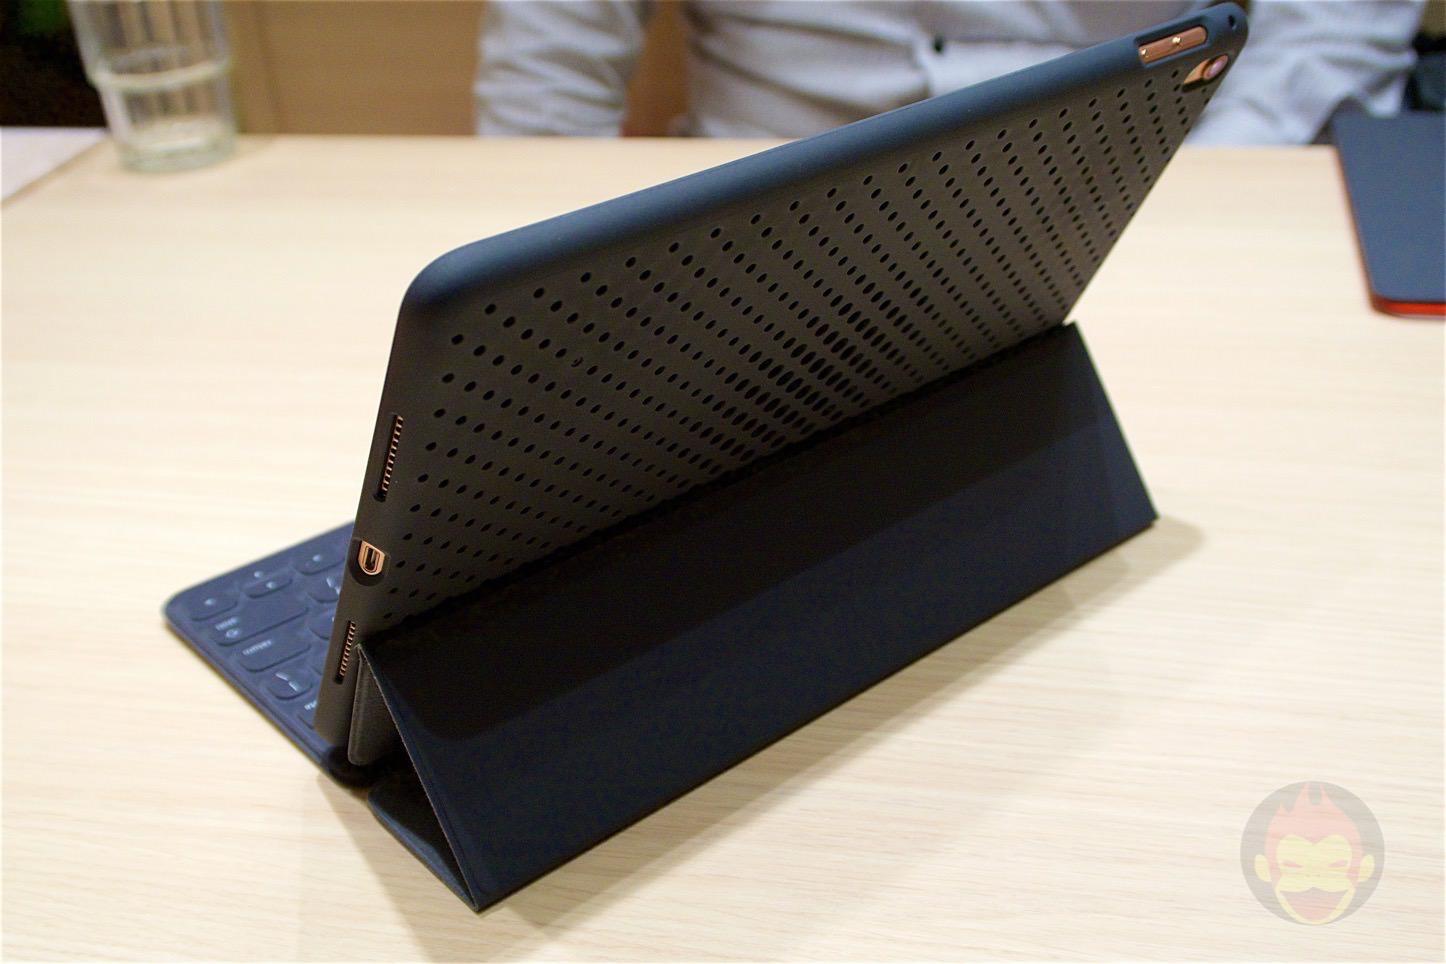 Andmesh-Mesh-Case-for-iPad-Pro-21.jpg